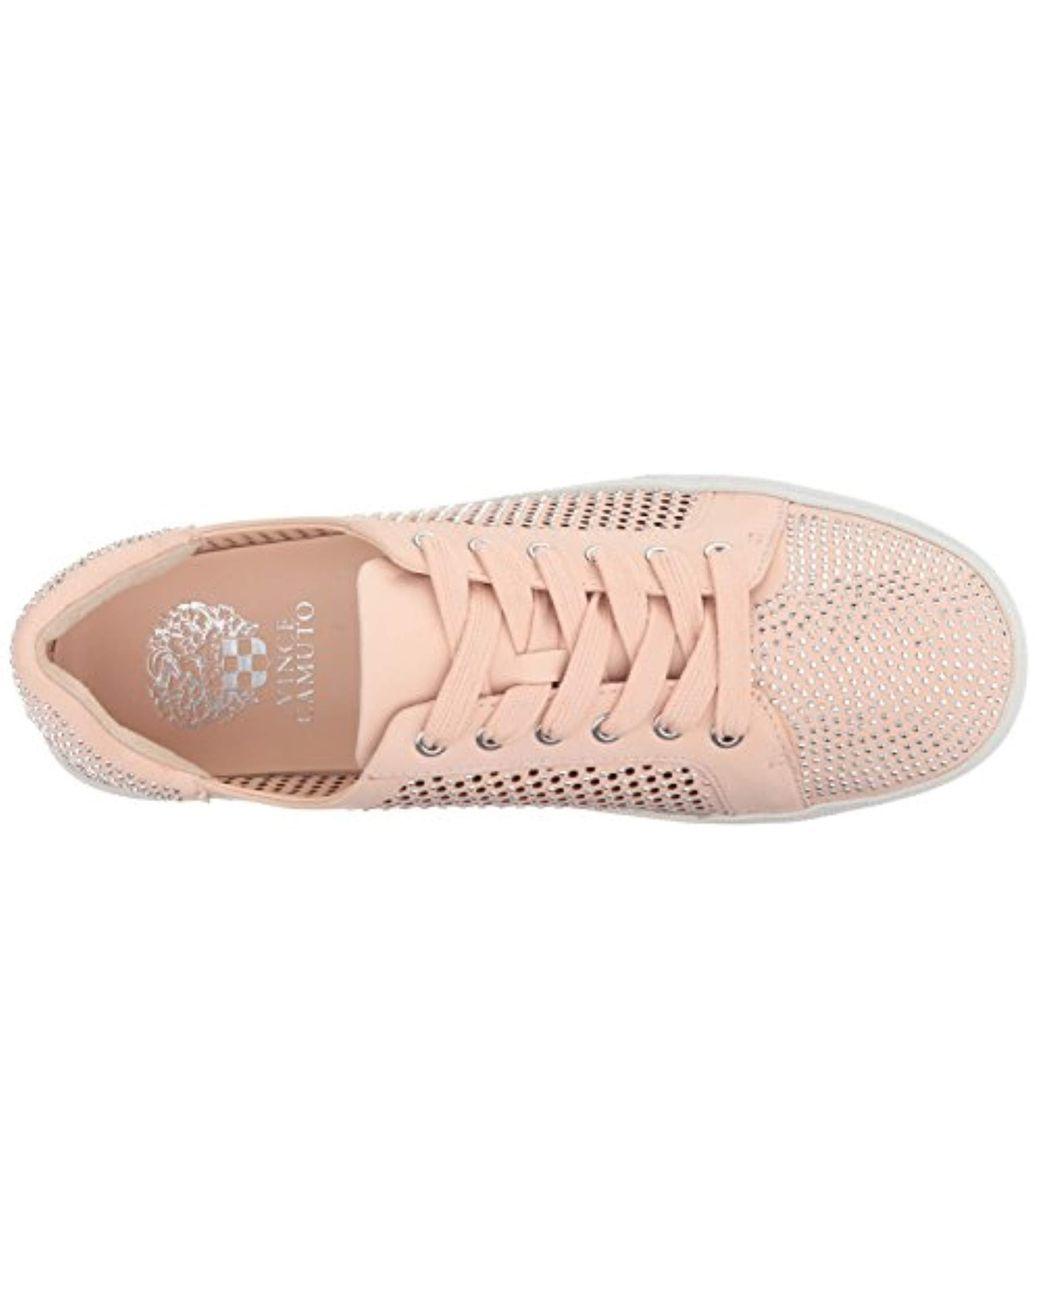 14b5b96b529ac Women's Chenta Sneaker